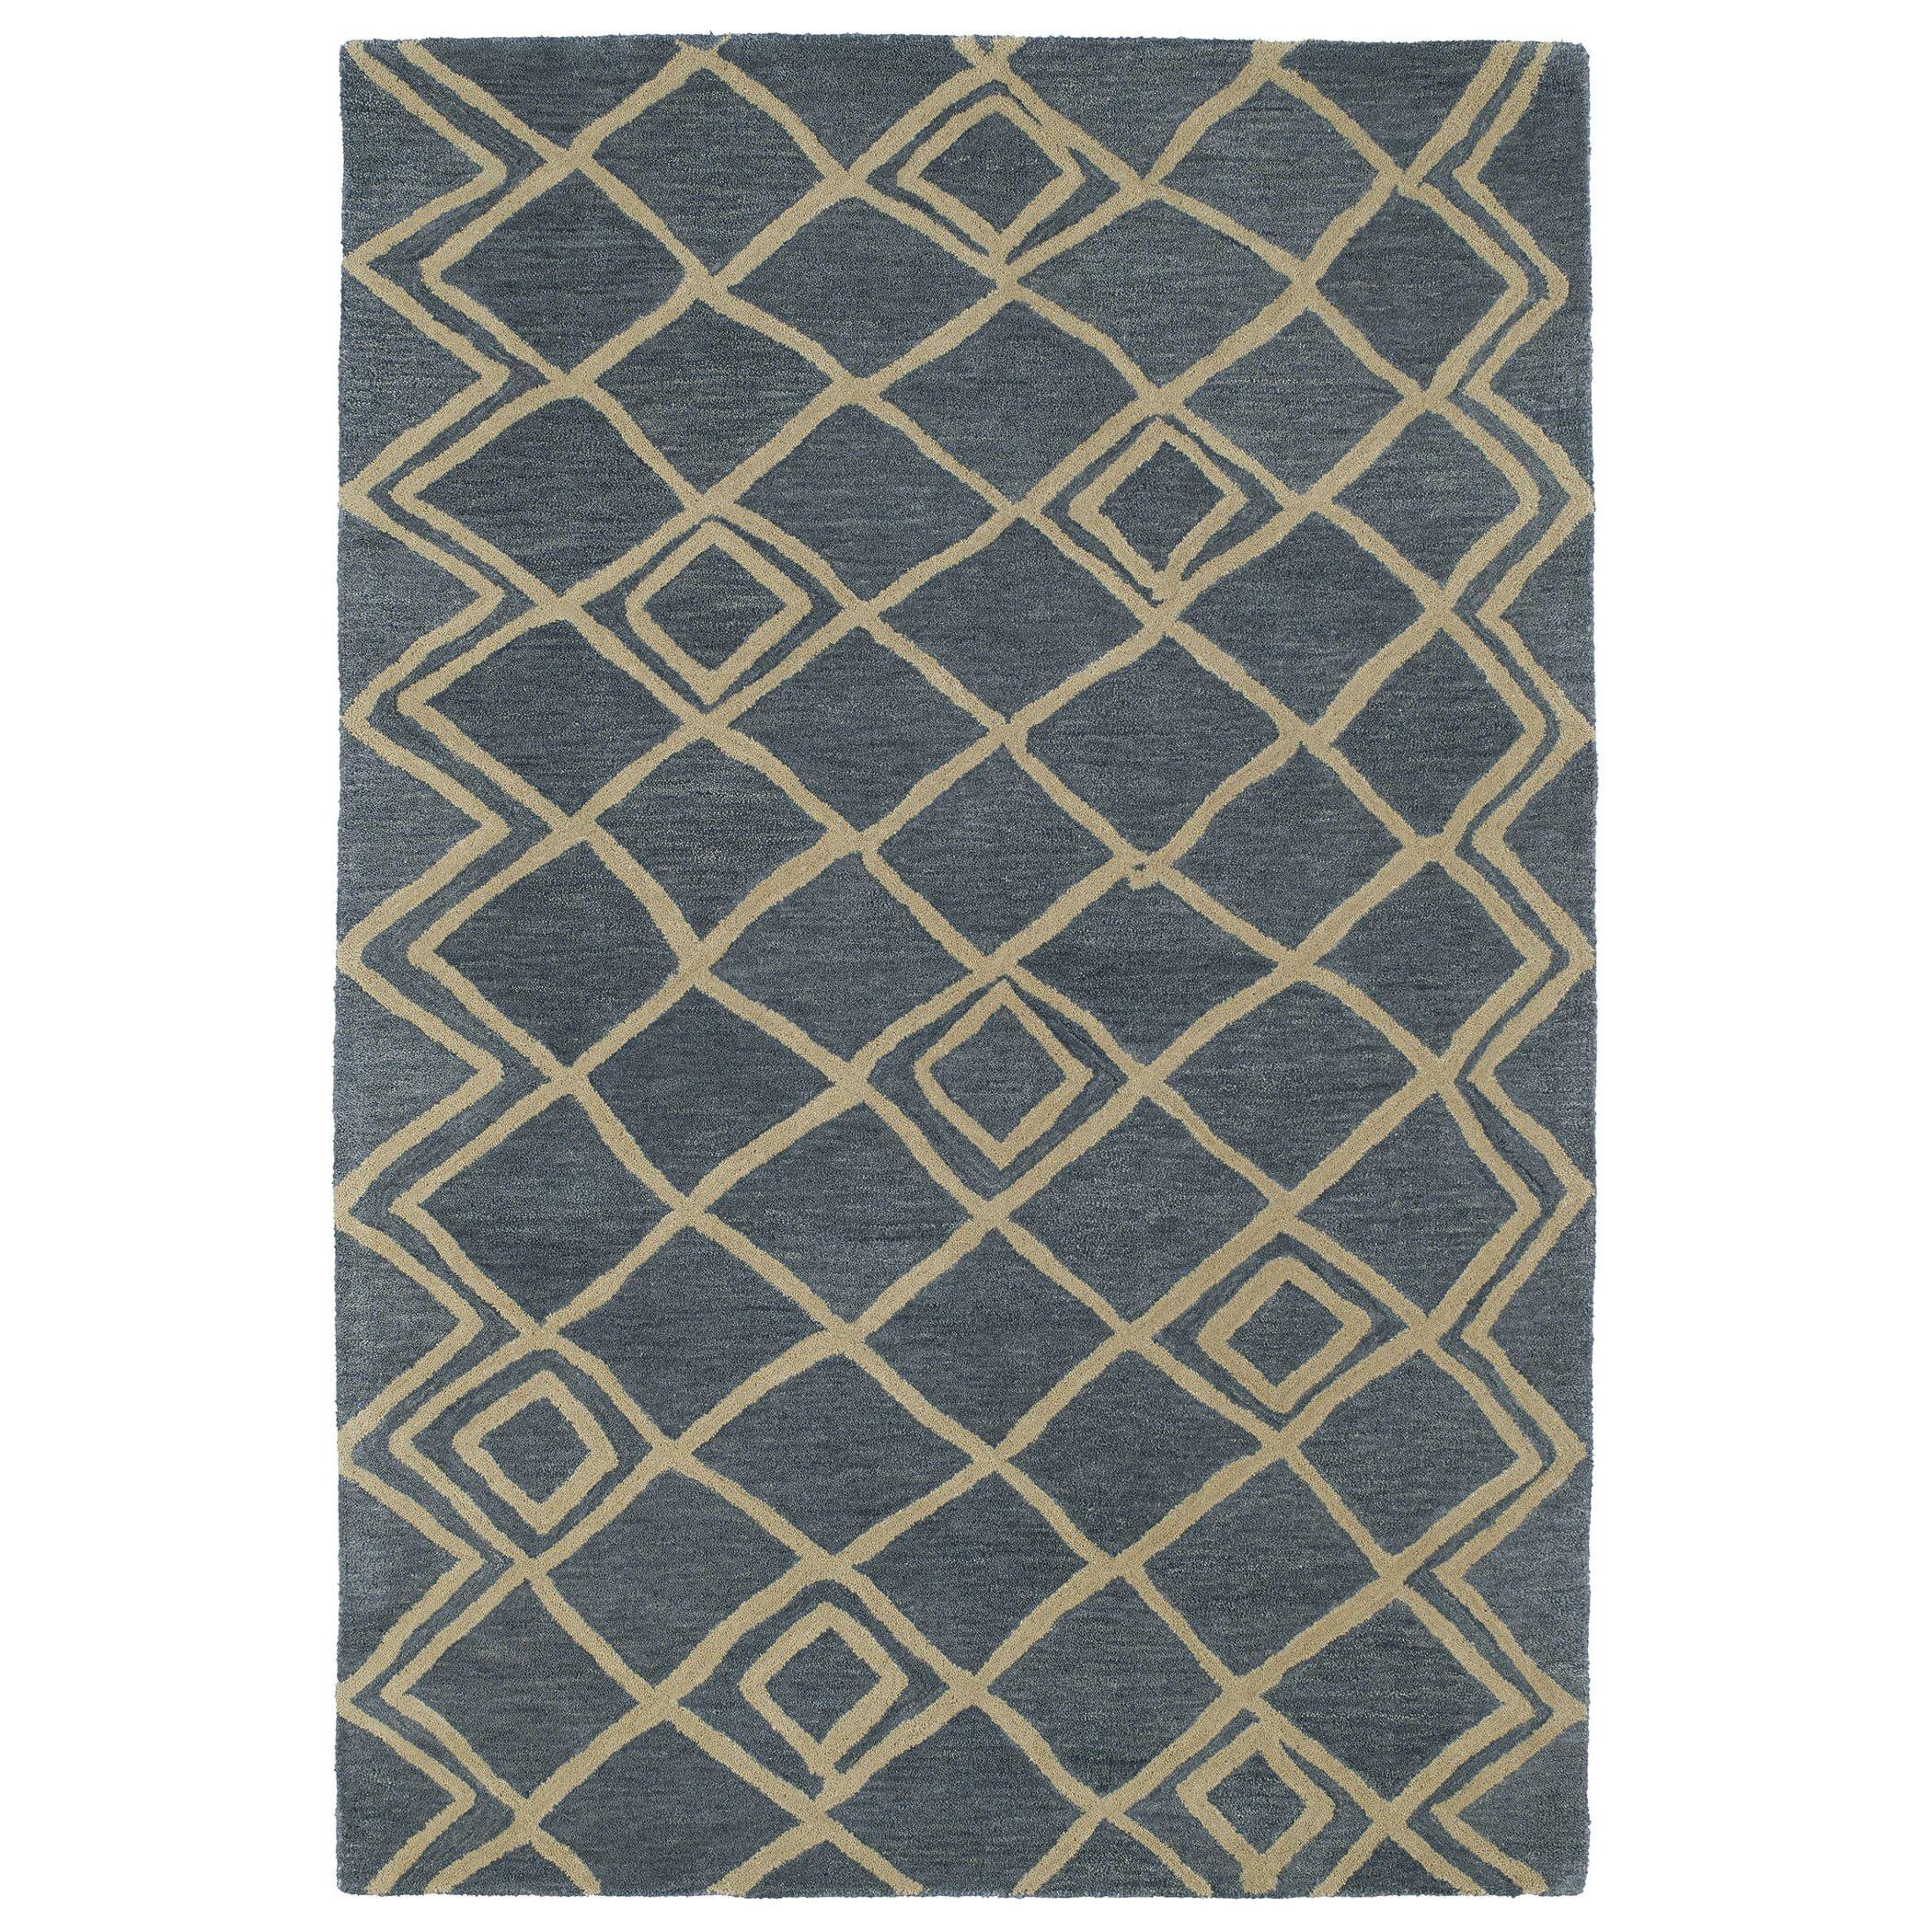 8 Apsley Place Kaleen Kaleen Casablanca Blue Geometric Rug Cas